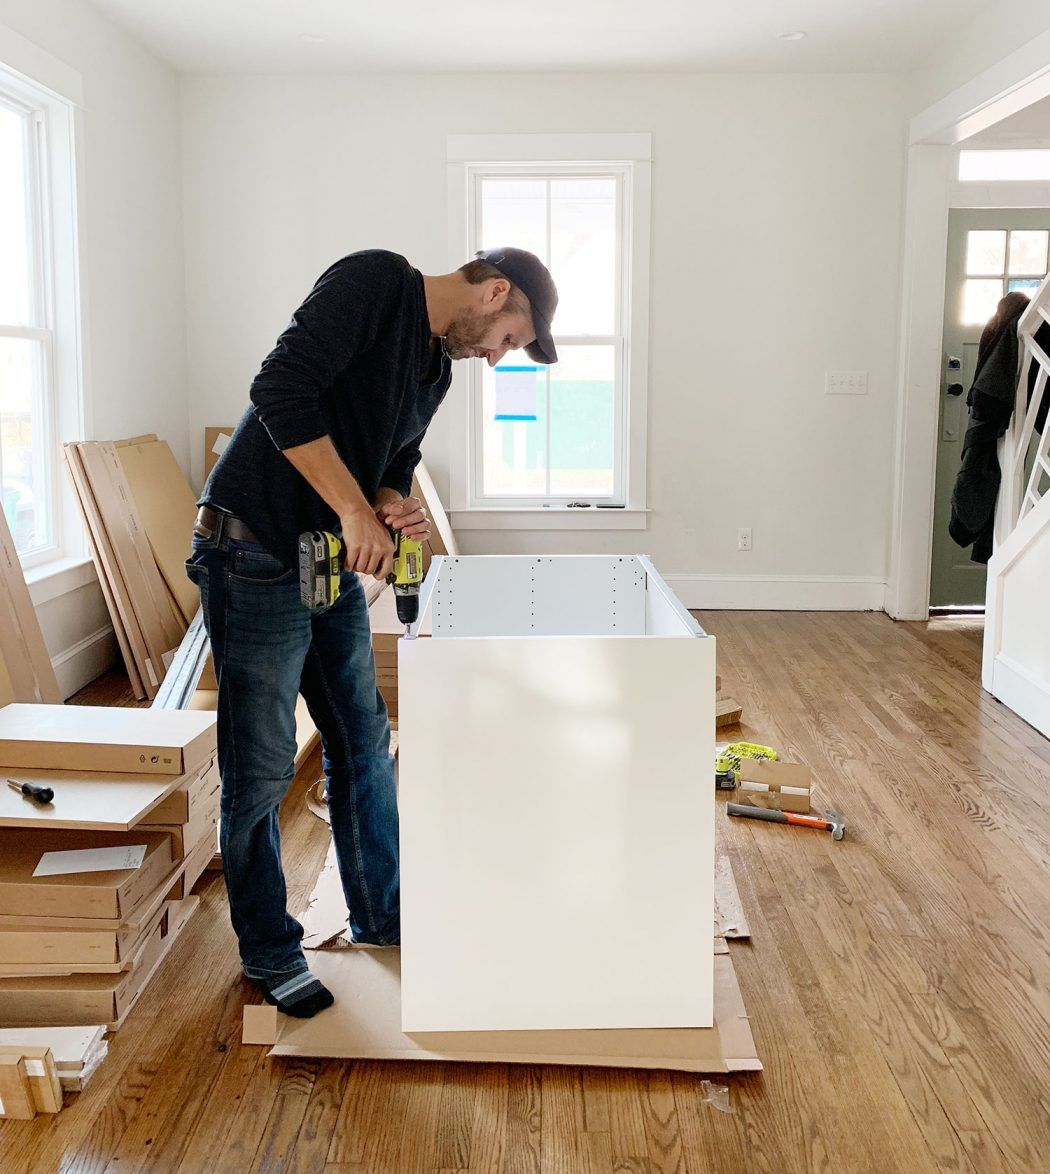 Tools Tricks For Installing An Ikea Kitchen Yourself Young House Love In 2020 Ikea Kitchen Kitchen Tools Design Ikea Kitchen Remodel